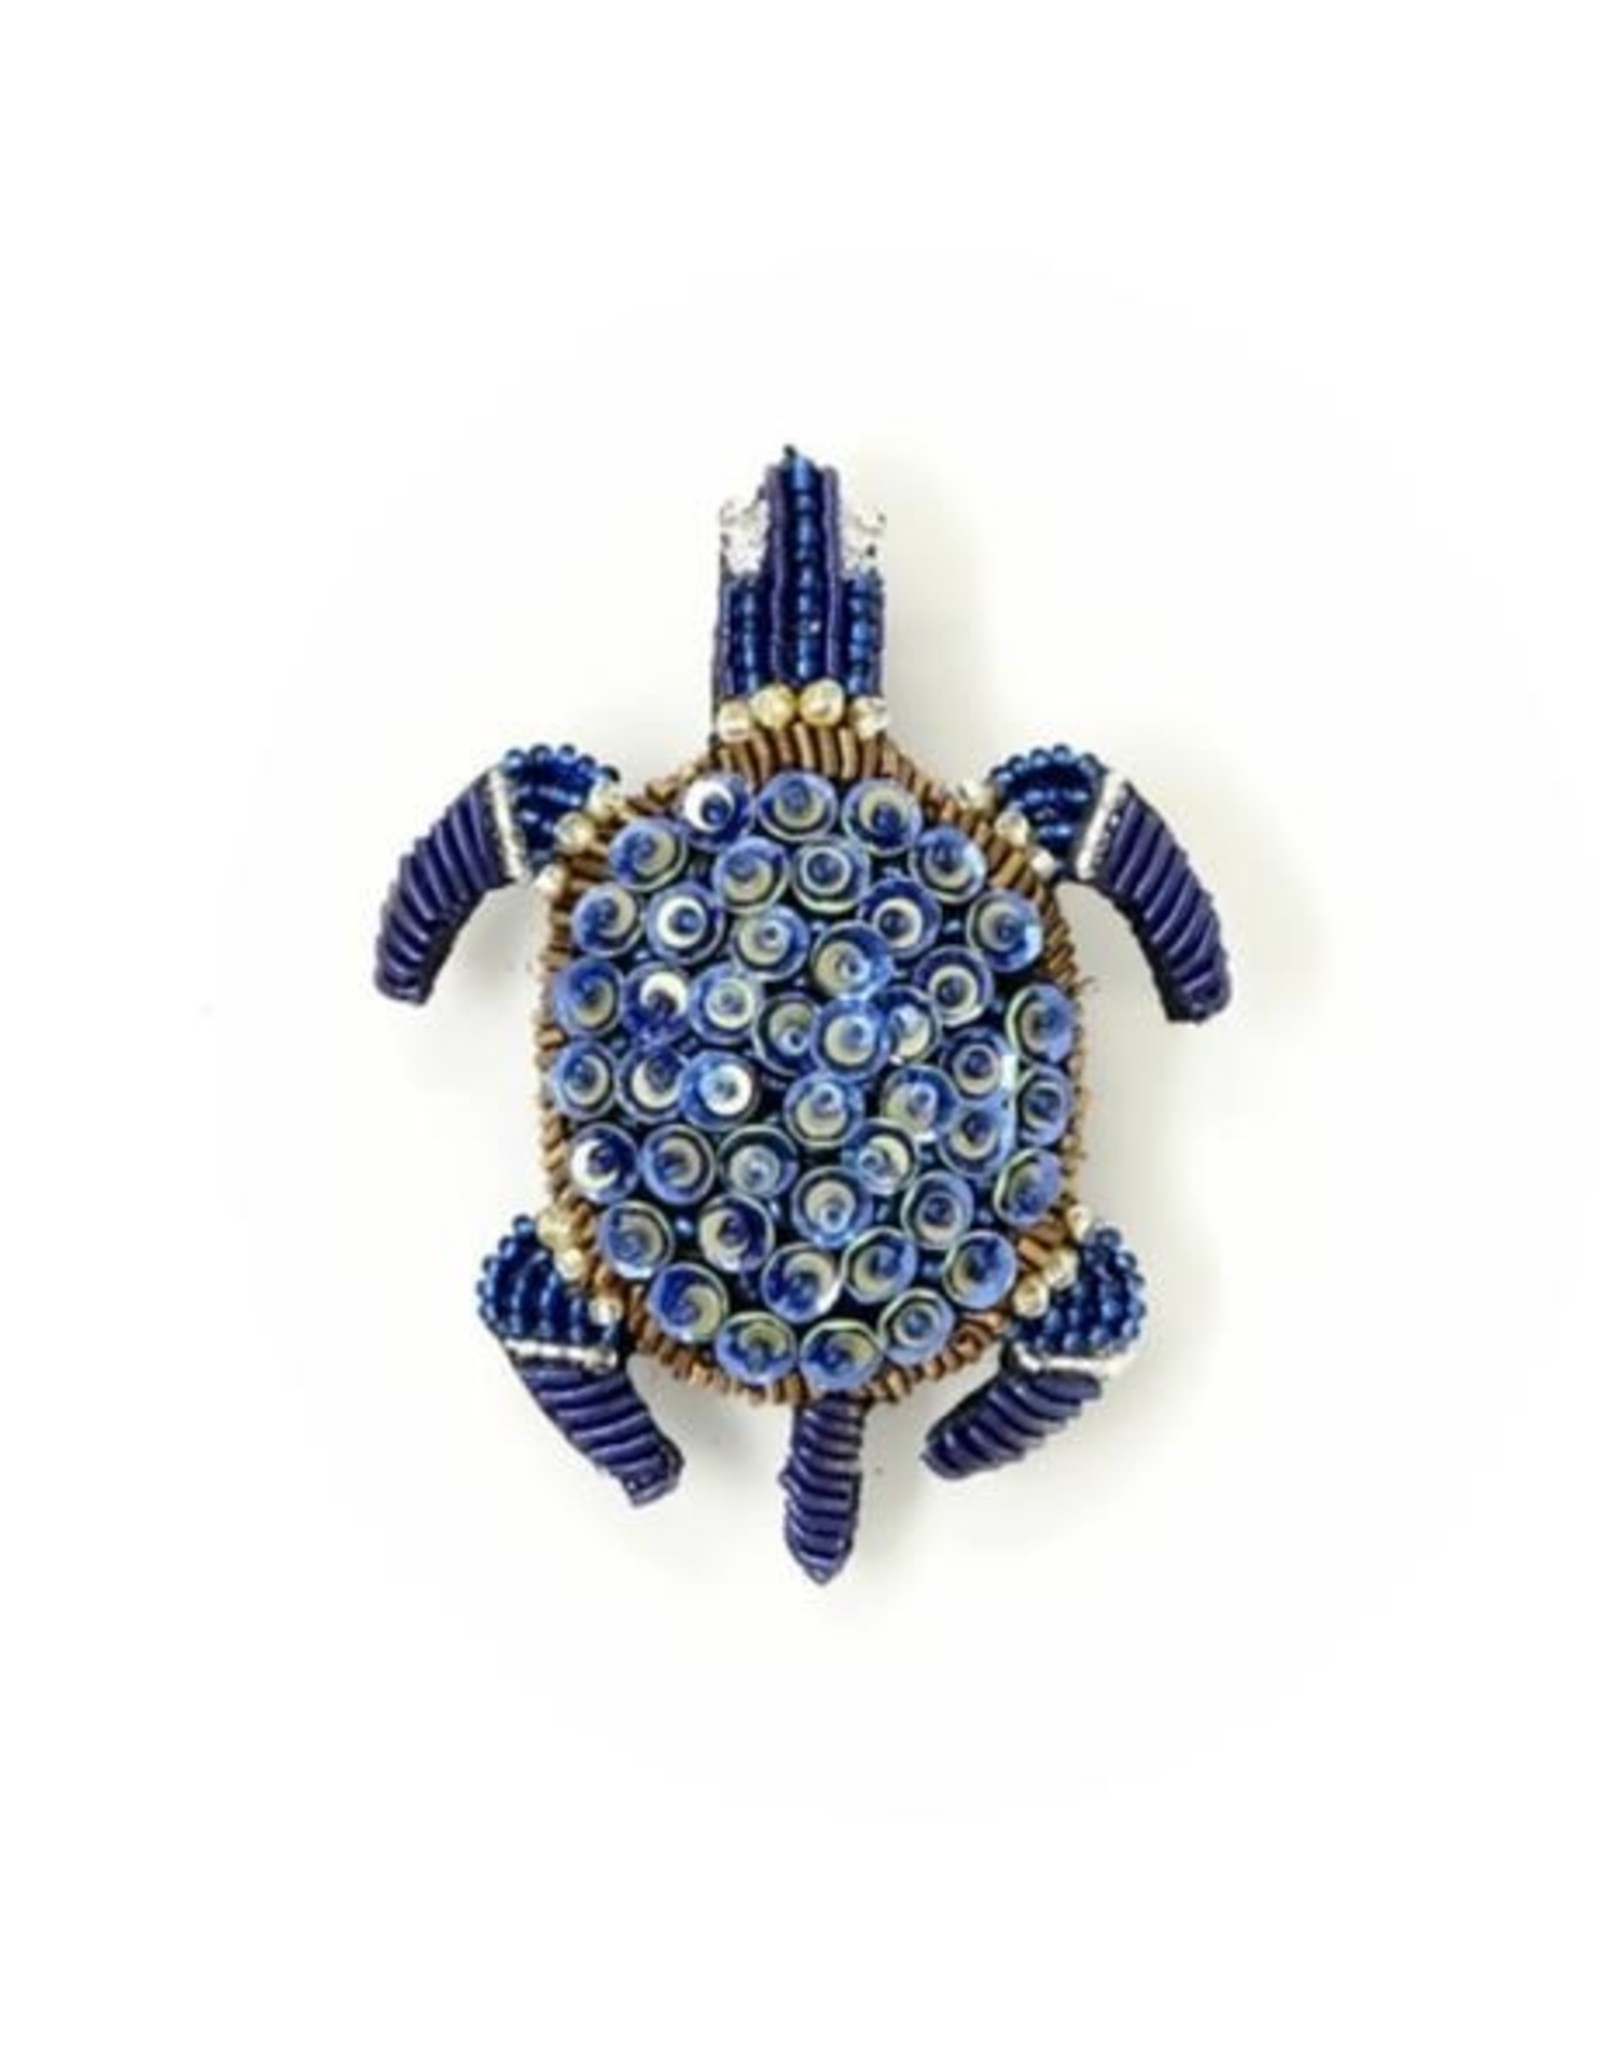 Trovelore Blue Sea Turtle Brooch Pin